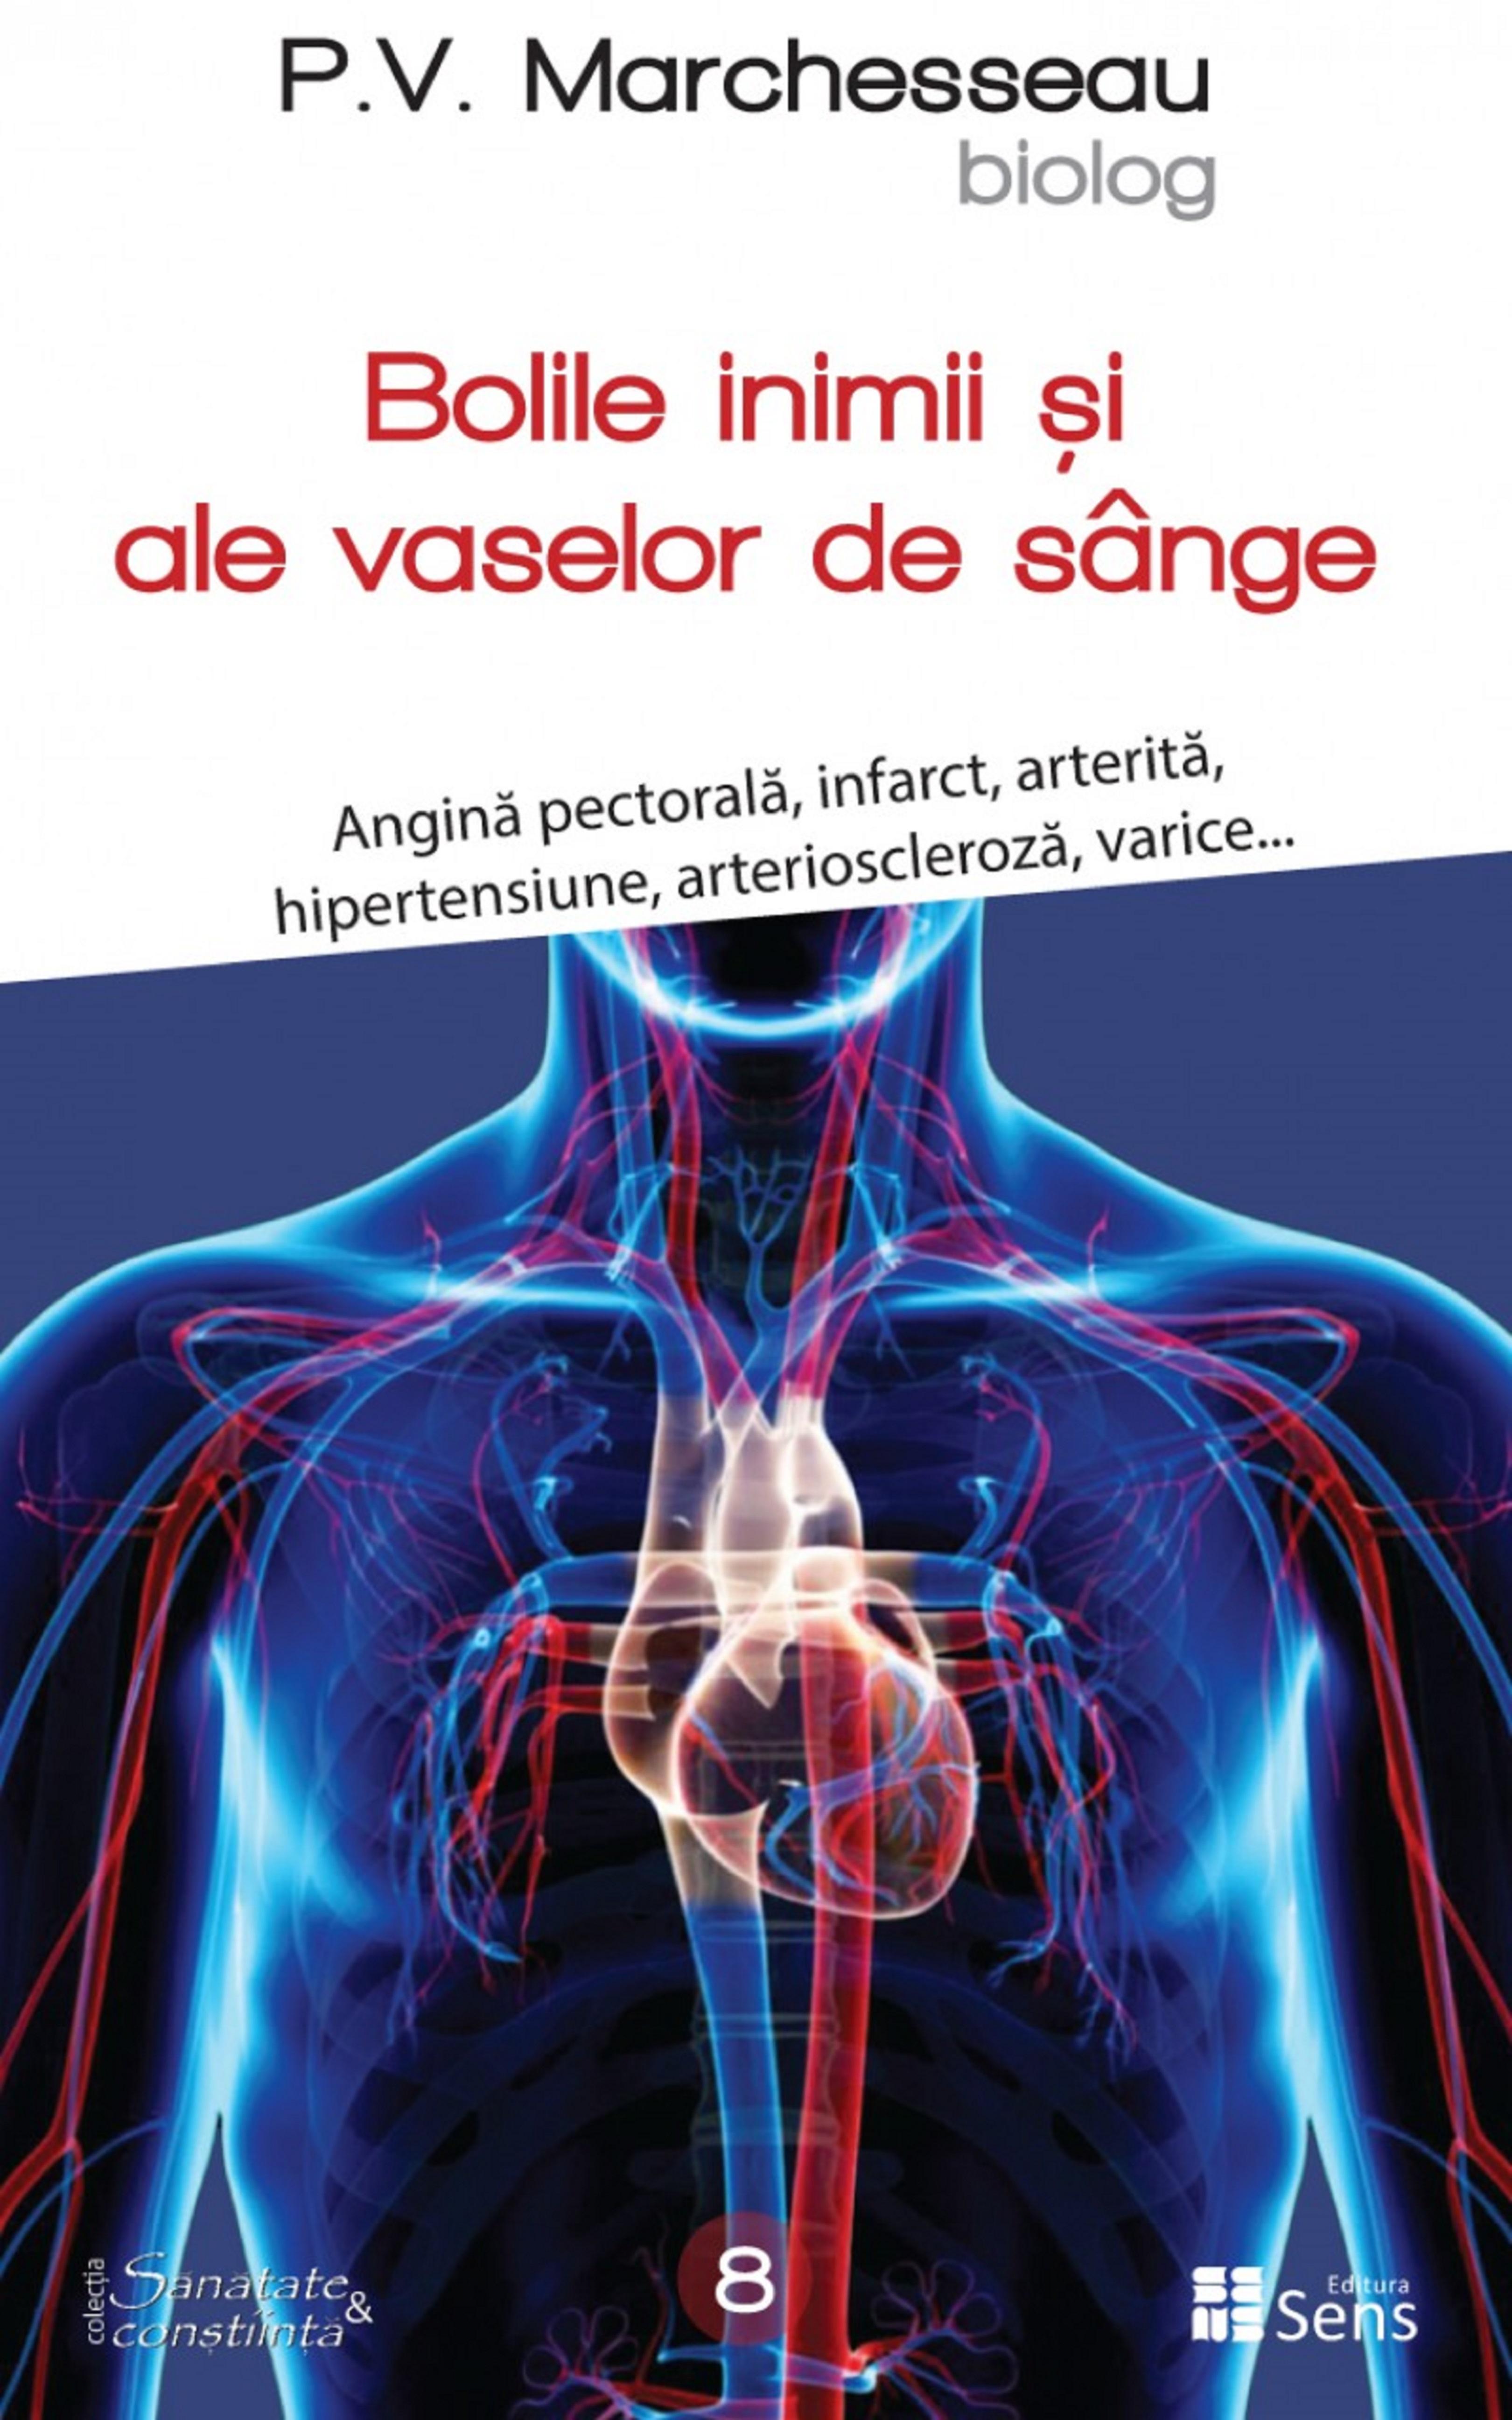 Bolile inimii si ale vaselor de sange